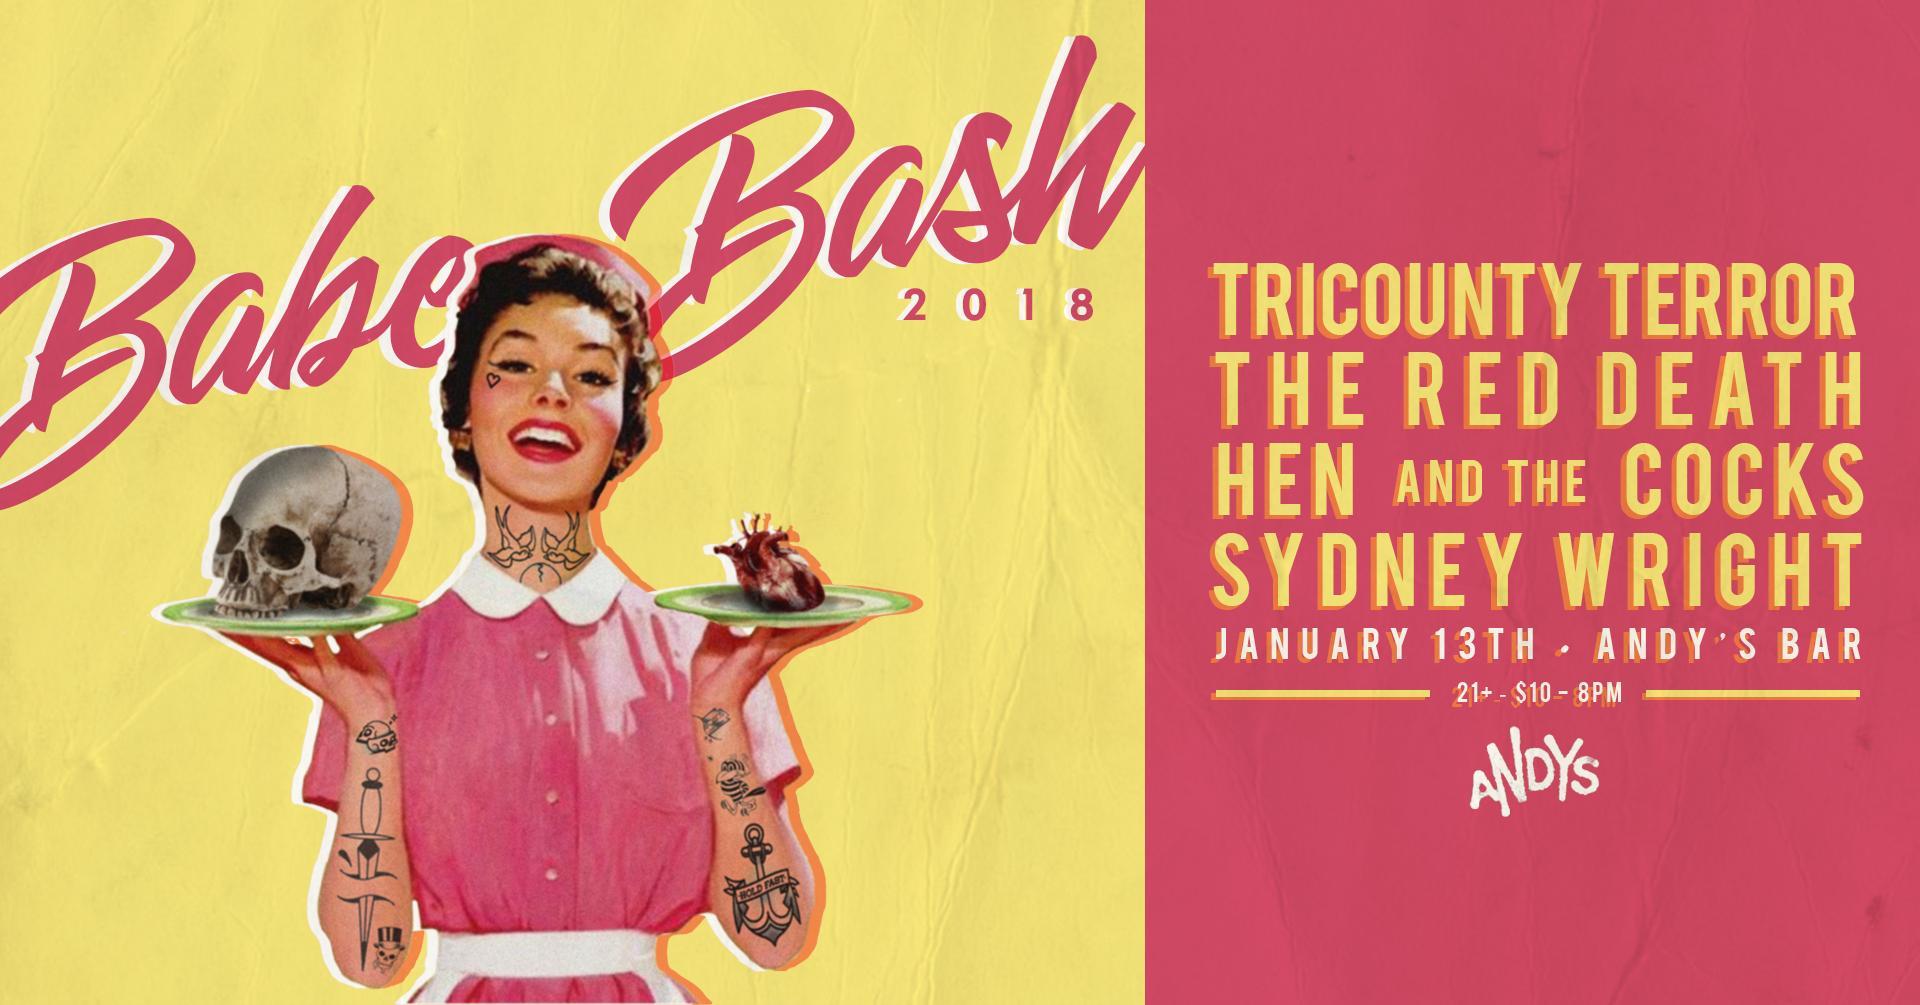 Babe Bash 2018